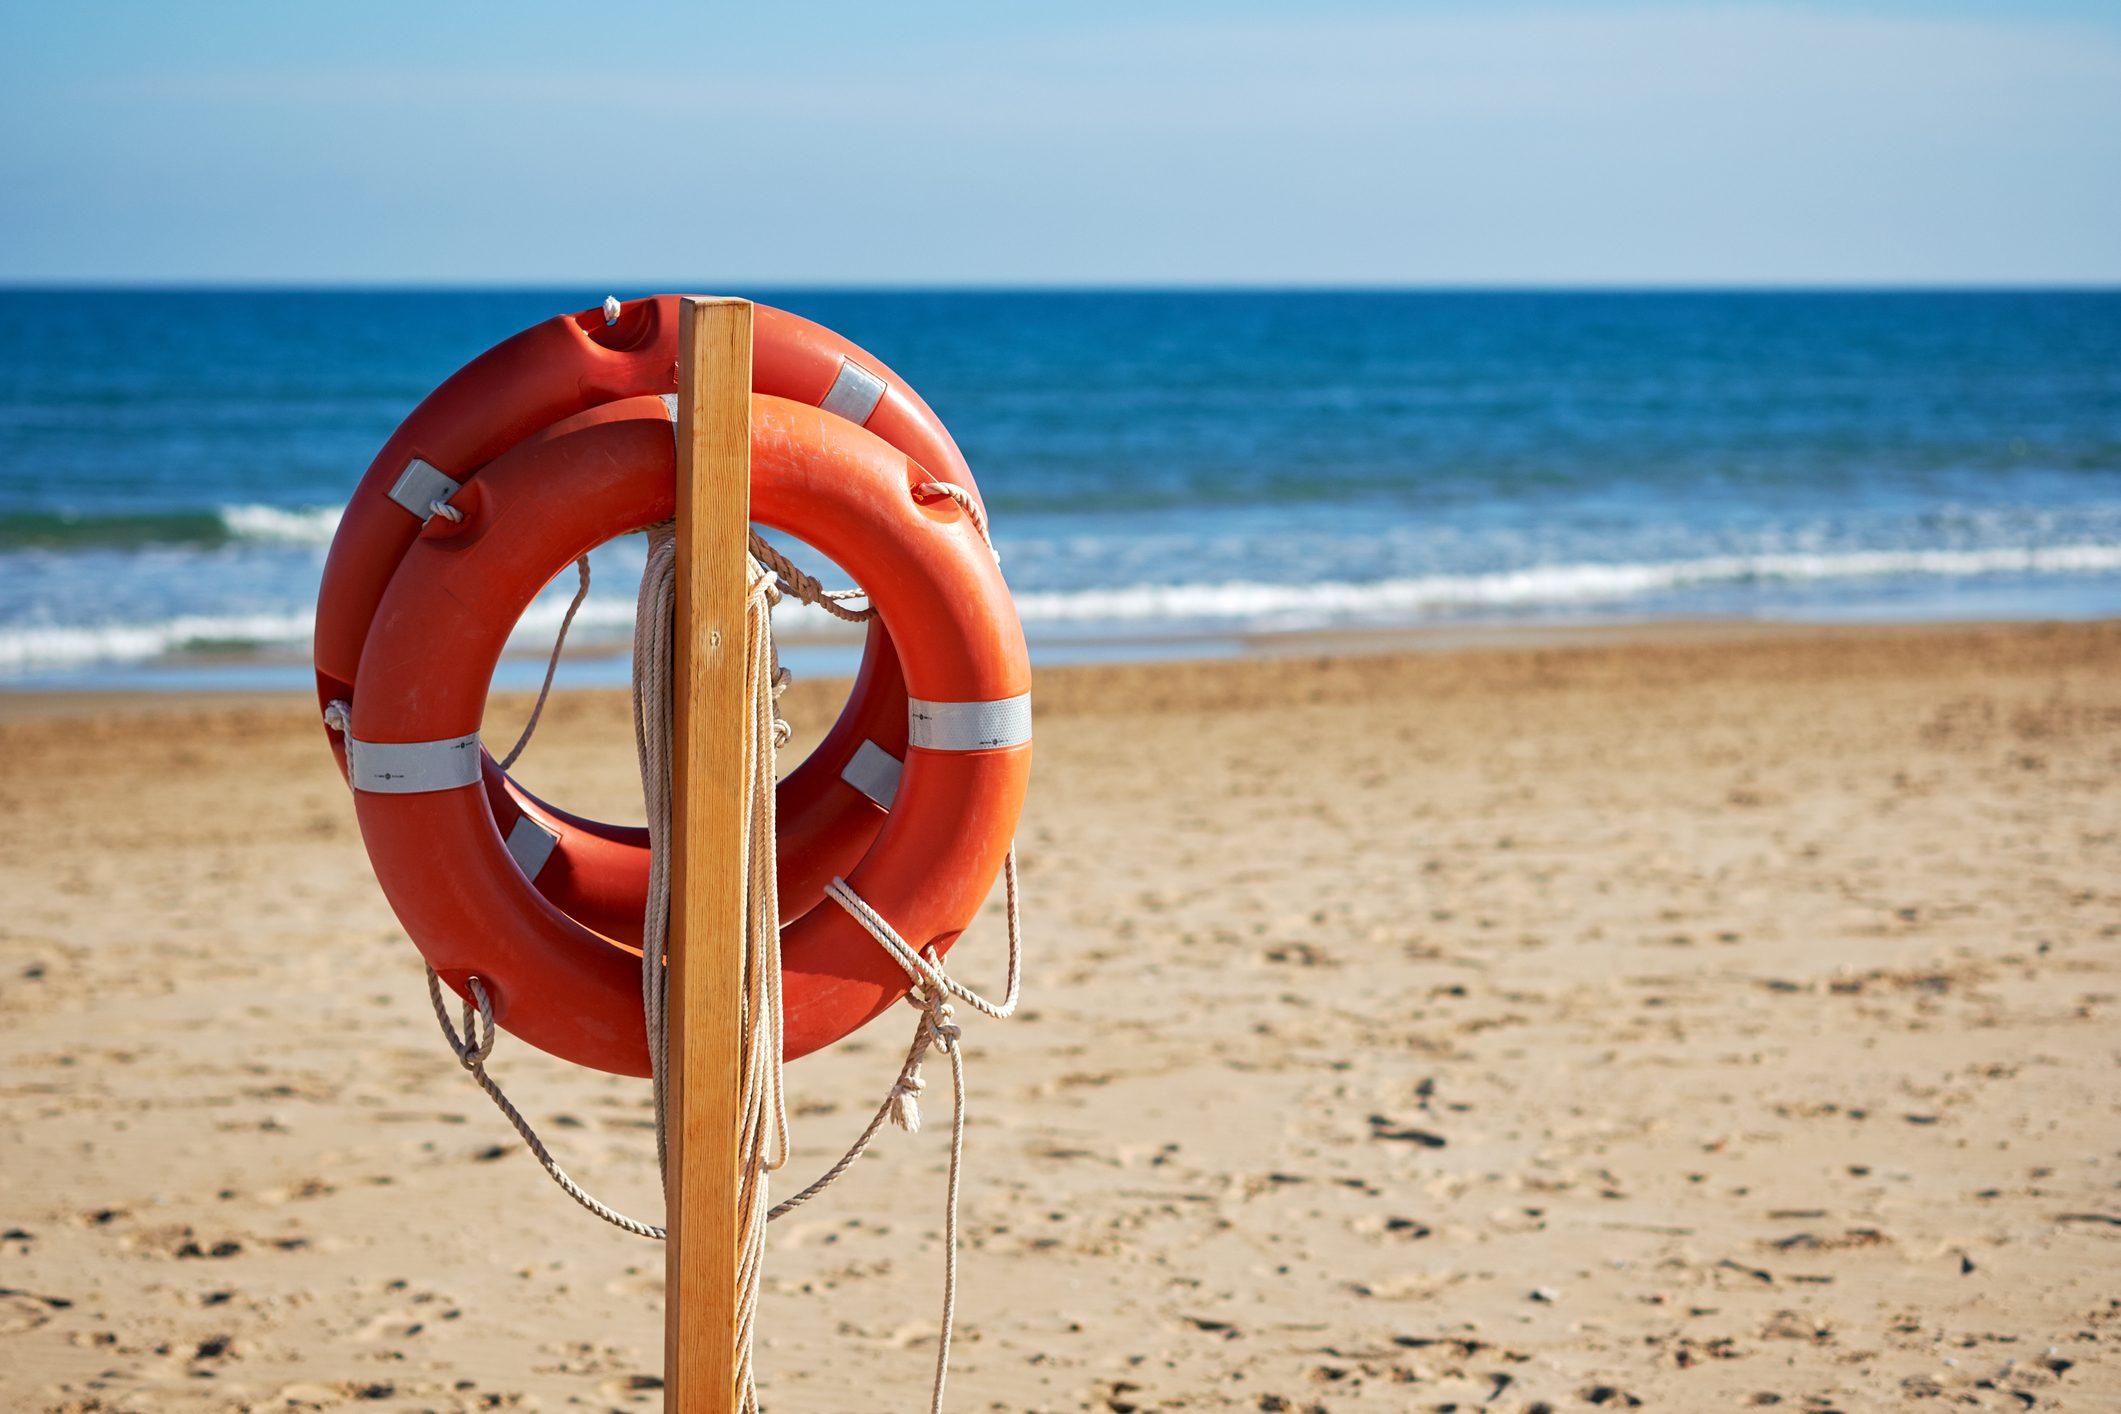 life buoys on the beach in the summer